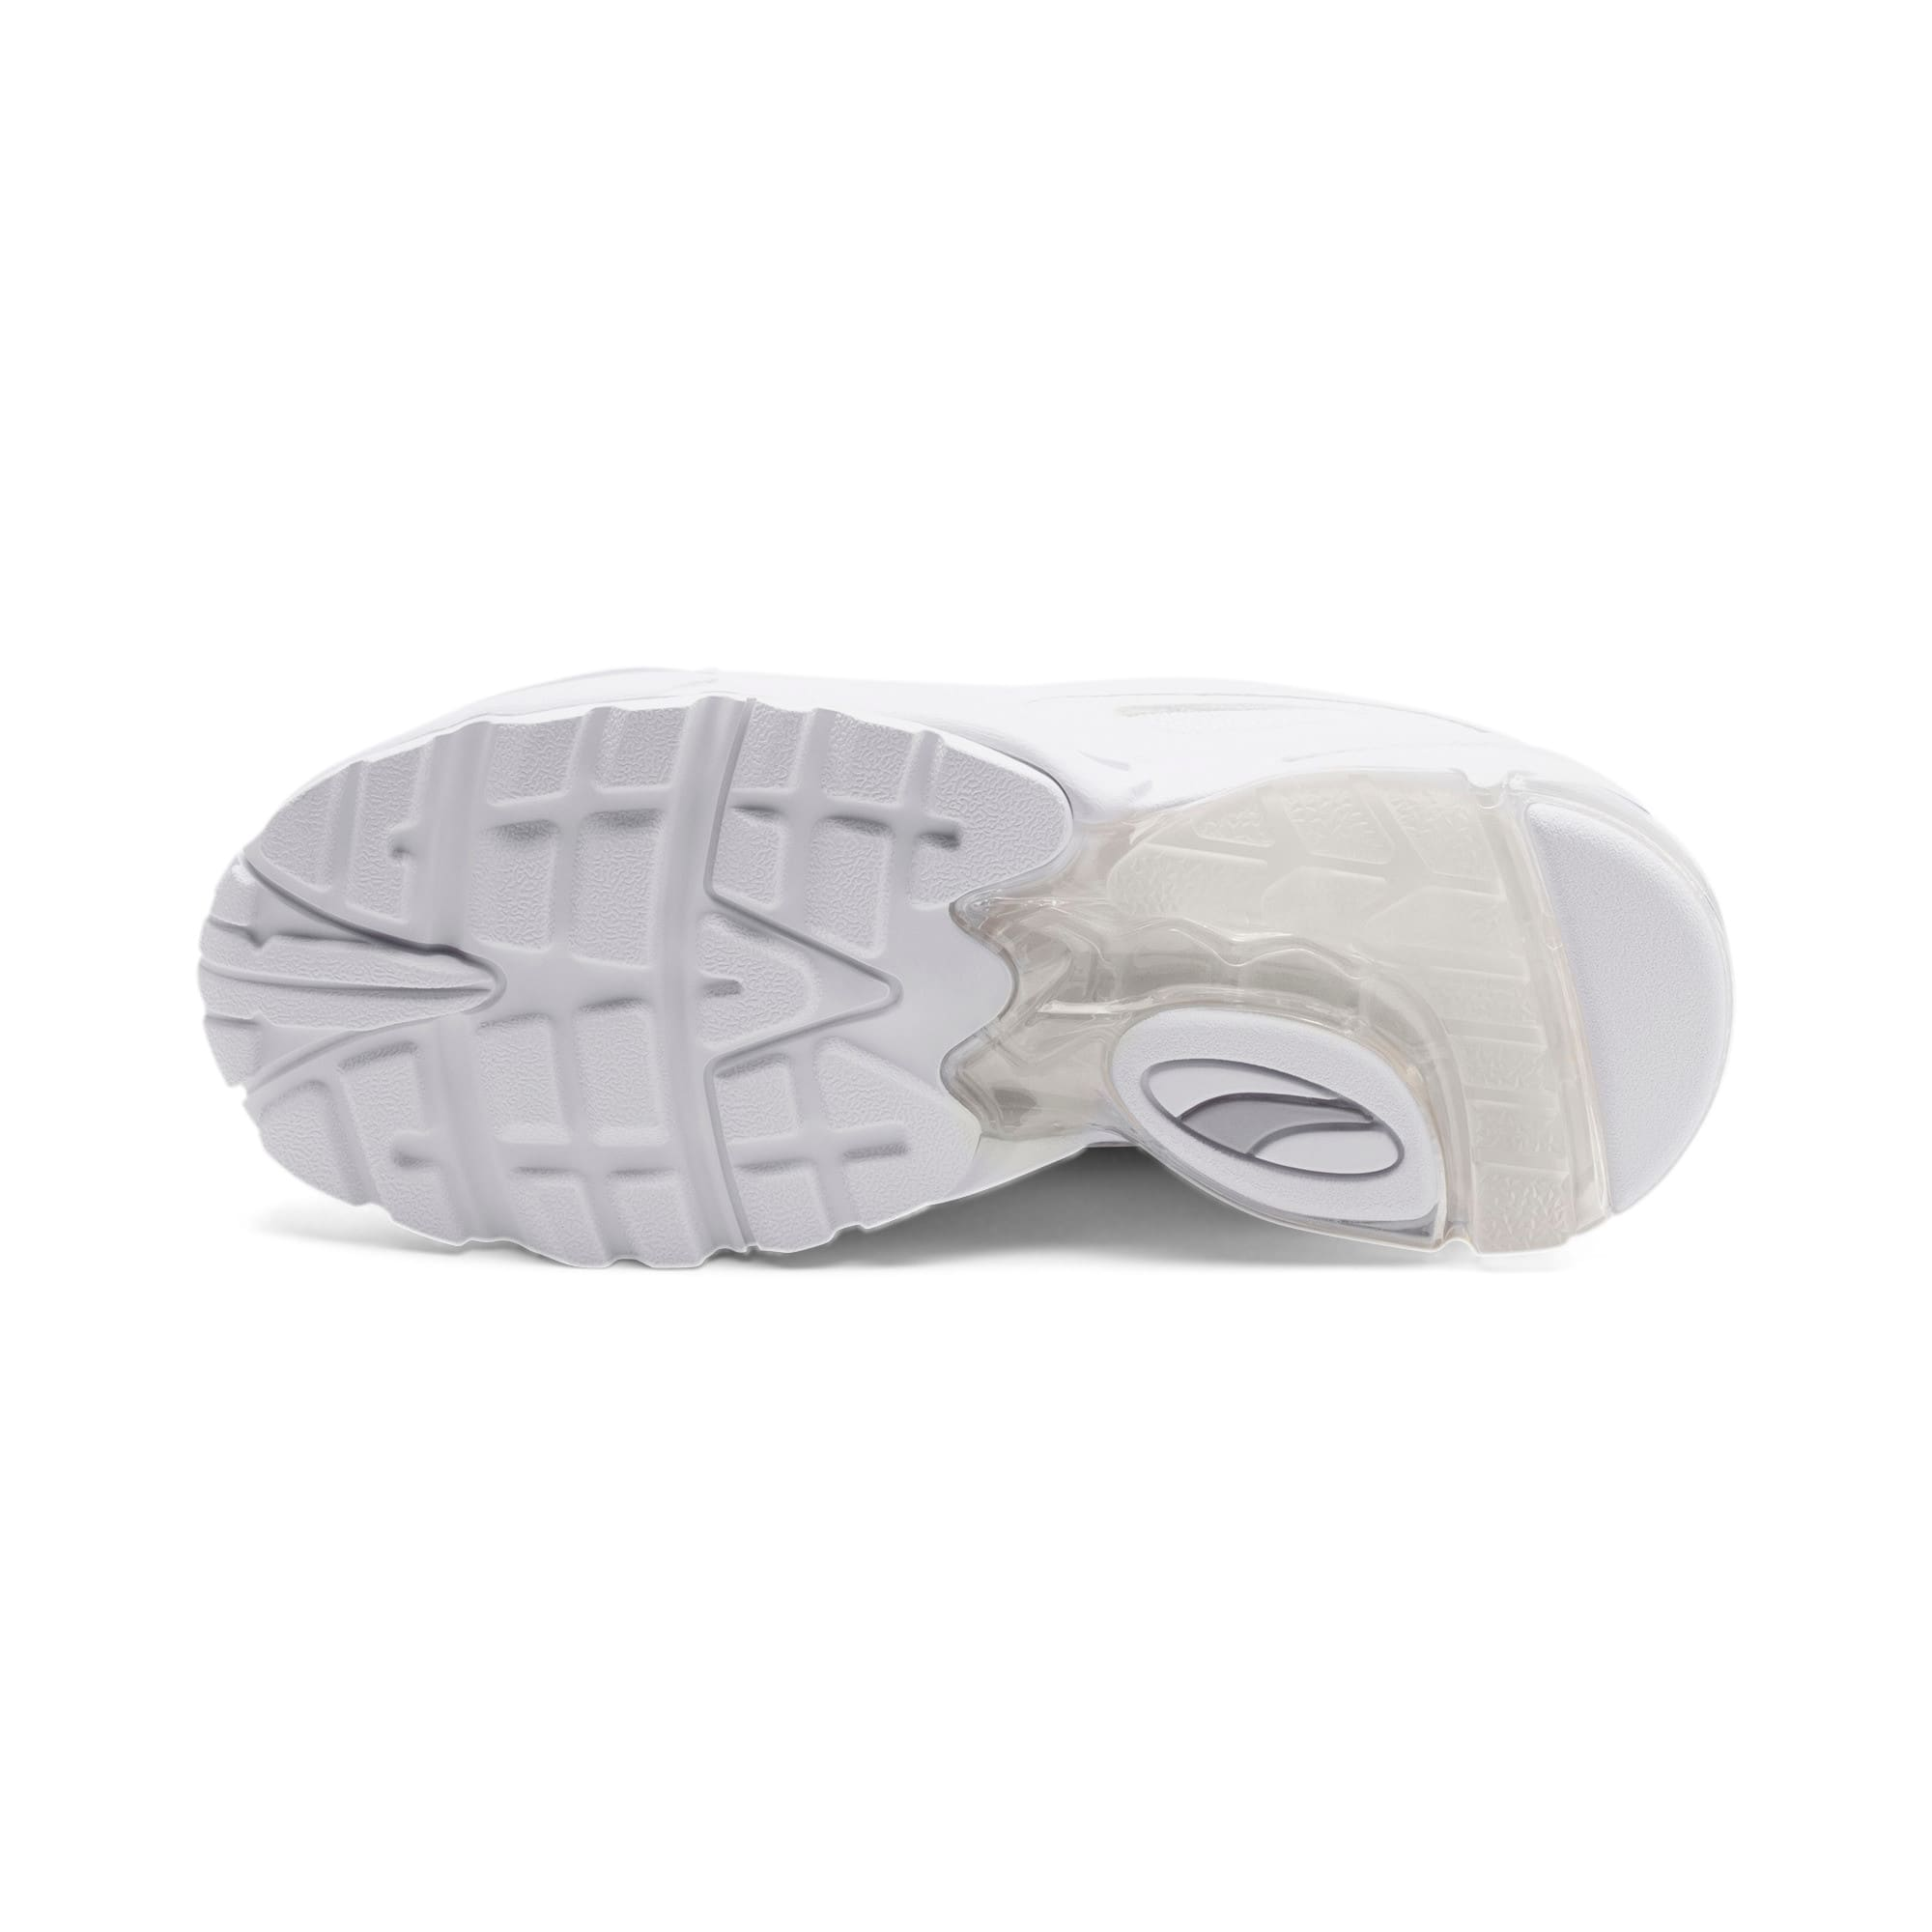 Thumbnail 4 of CELL Stellar Damen Sneaker, Puma White-Silver, medium